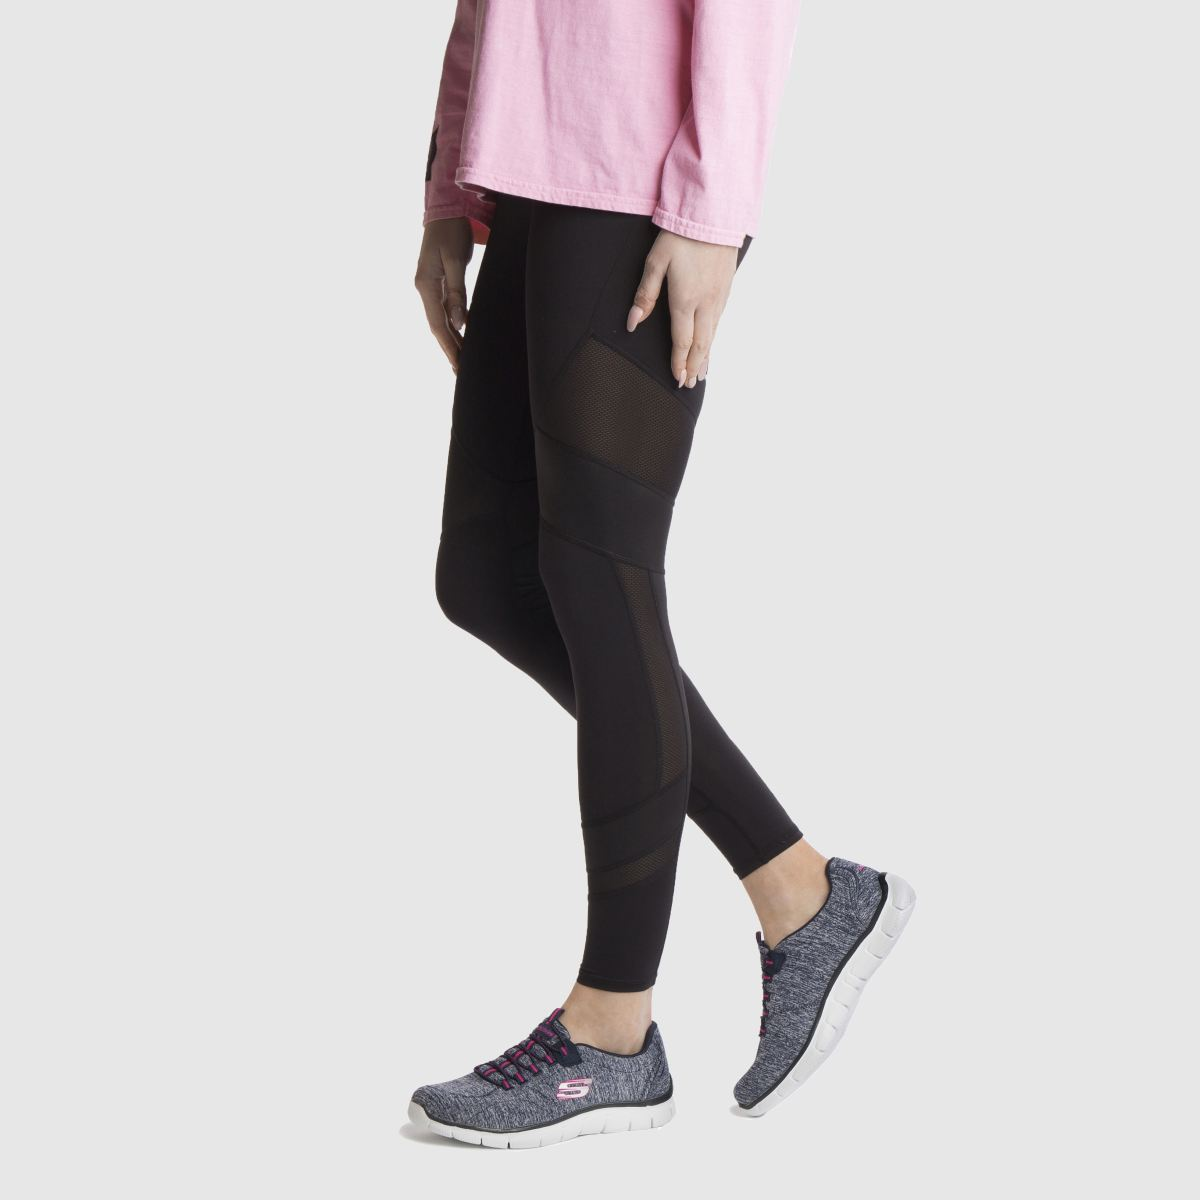 Damen schuh Marineblau-weiß skechers Empire Heart To Heart Sneaker | schuh Damen Gute Qualität beliebte Schuhe 43d7f6